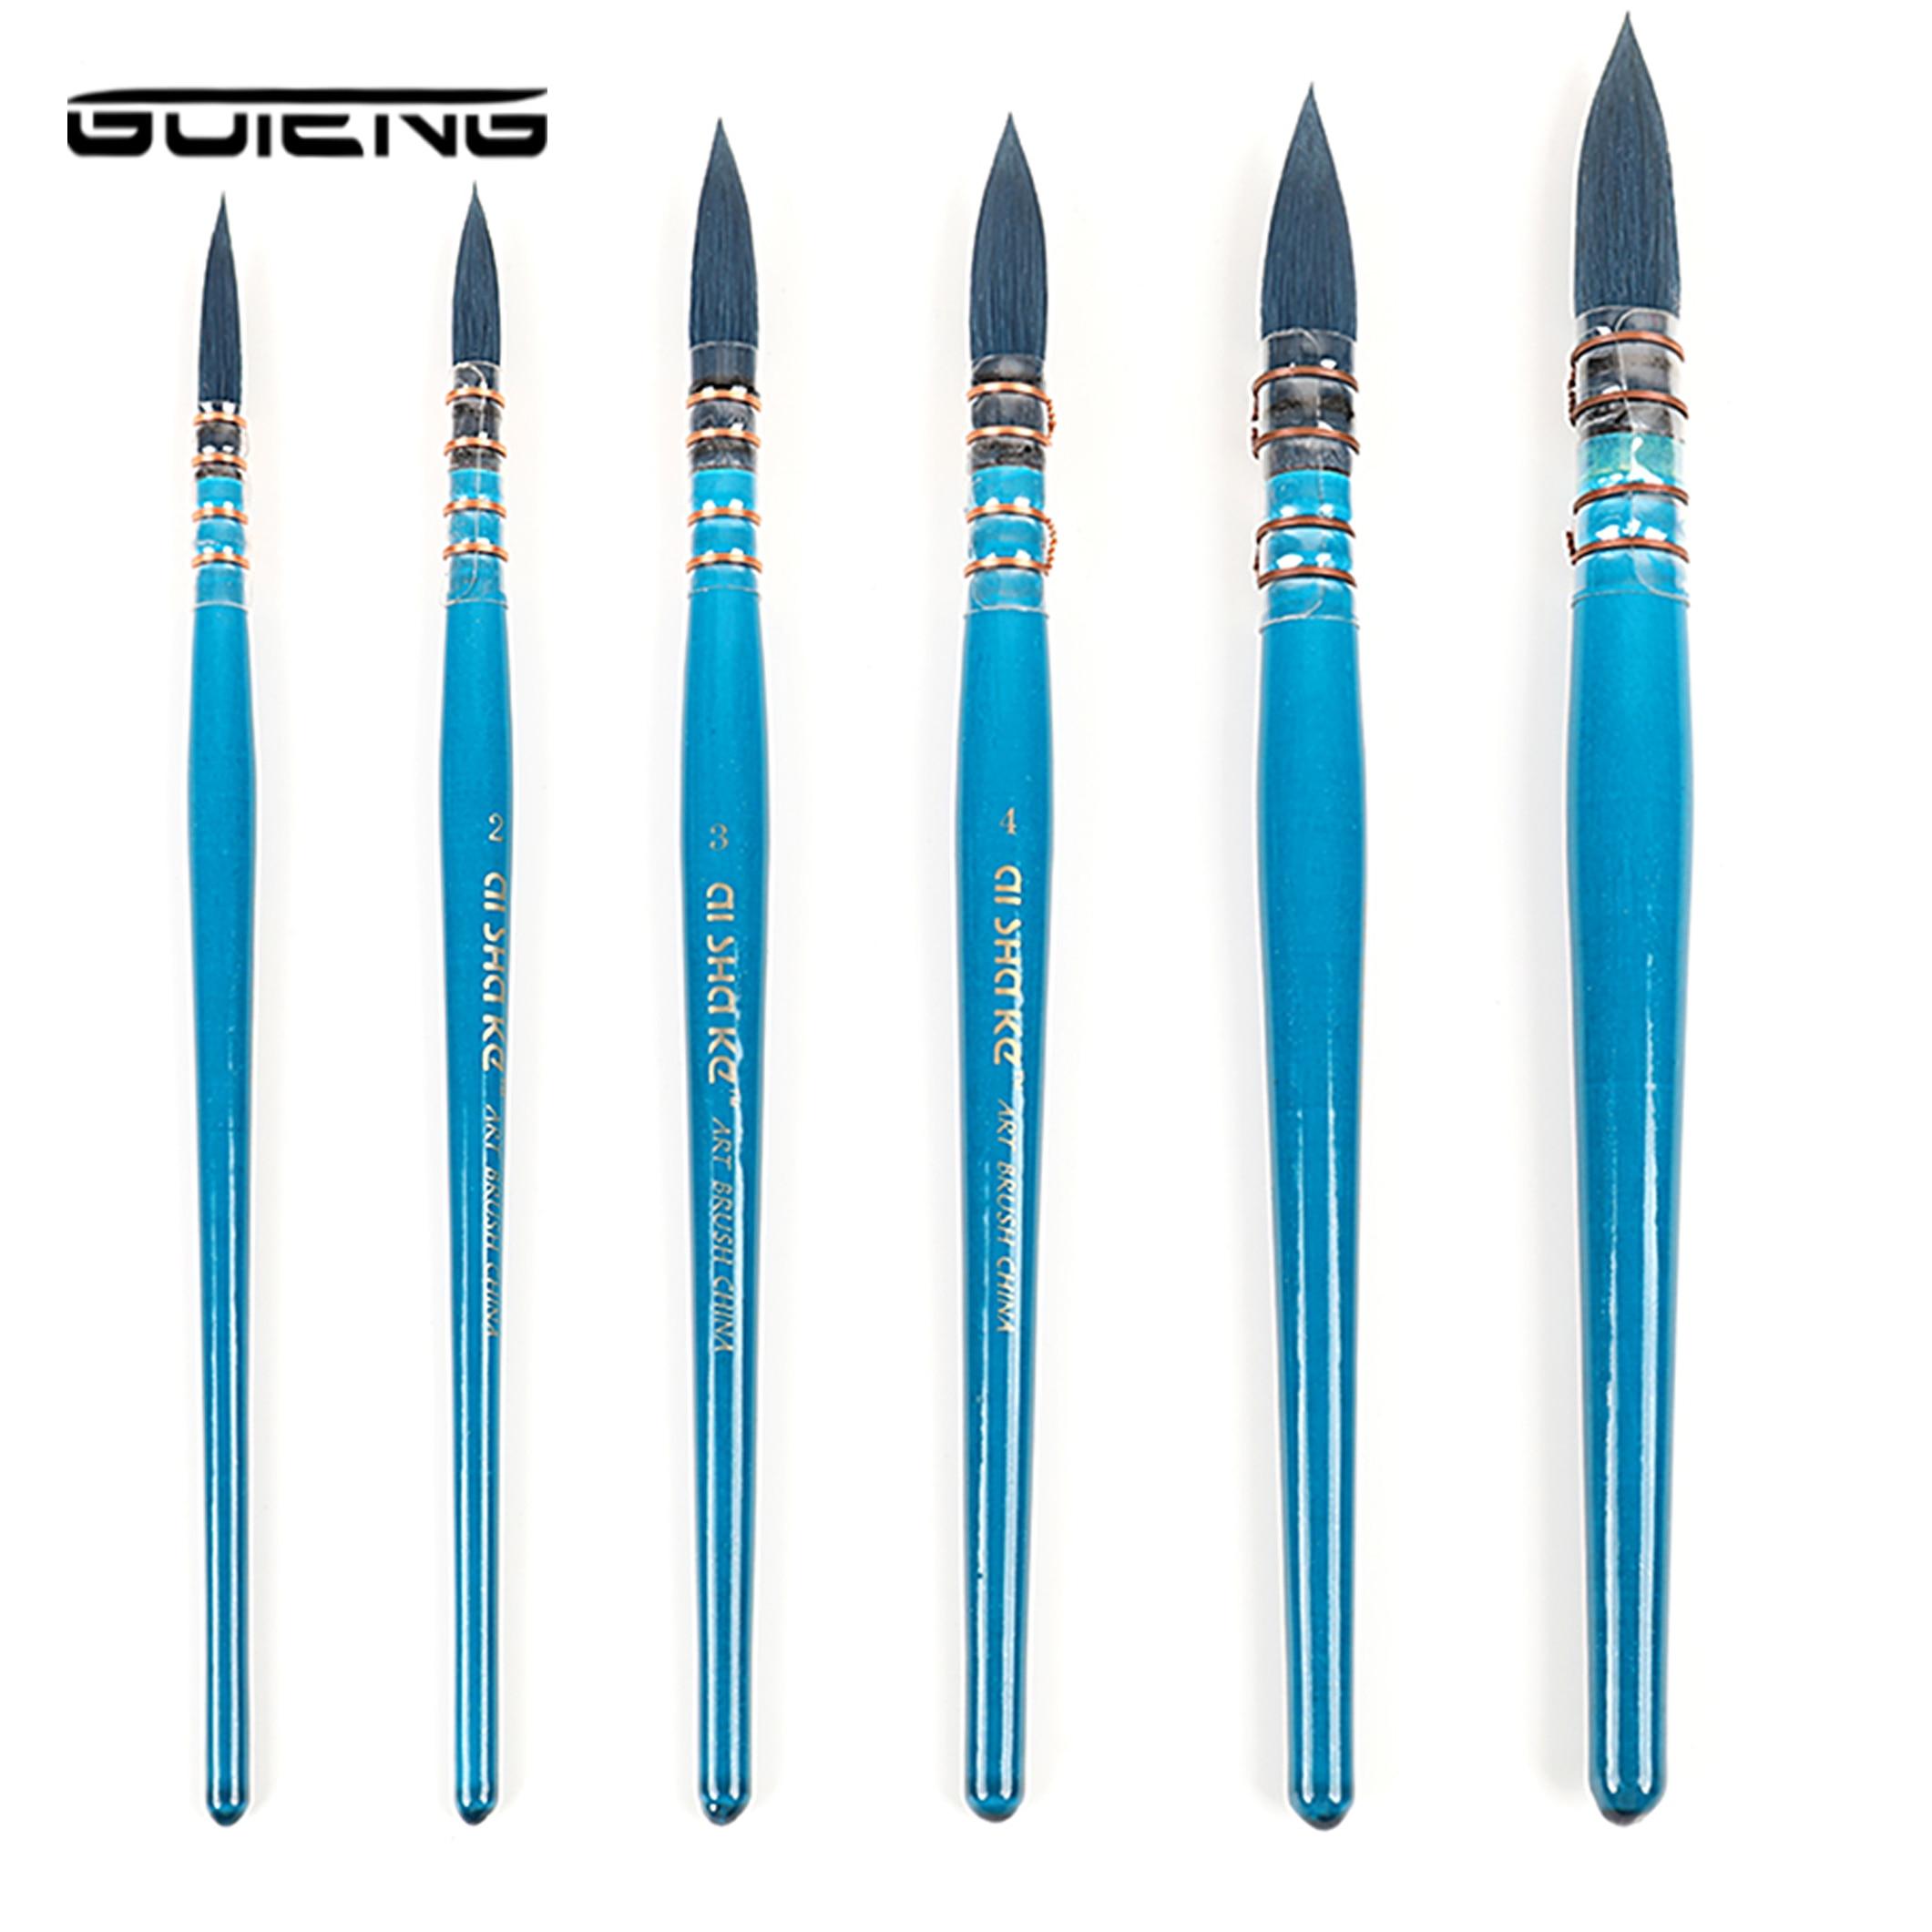 Pincel para escribir en madera azul para el artista pincel para pintar en acuarela pinceles para pintar en punta de estilo francés para suministros de arte en acuarela